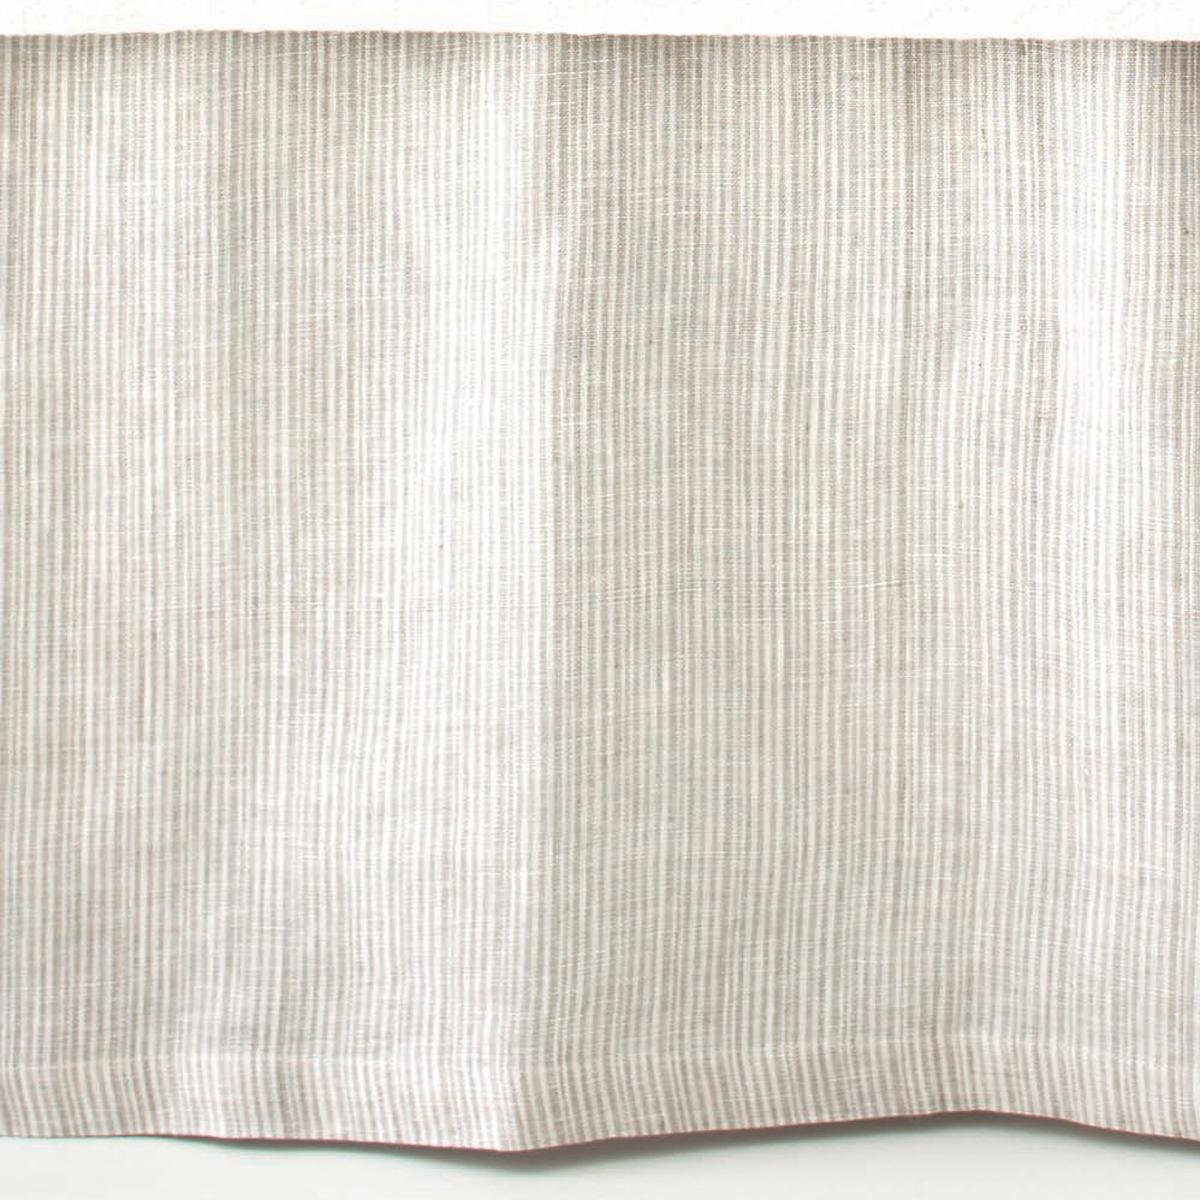 Pinstripe Linen Dove Grey Bed Skirt